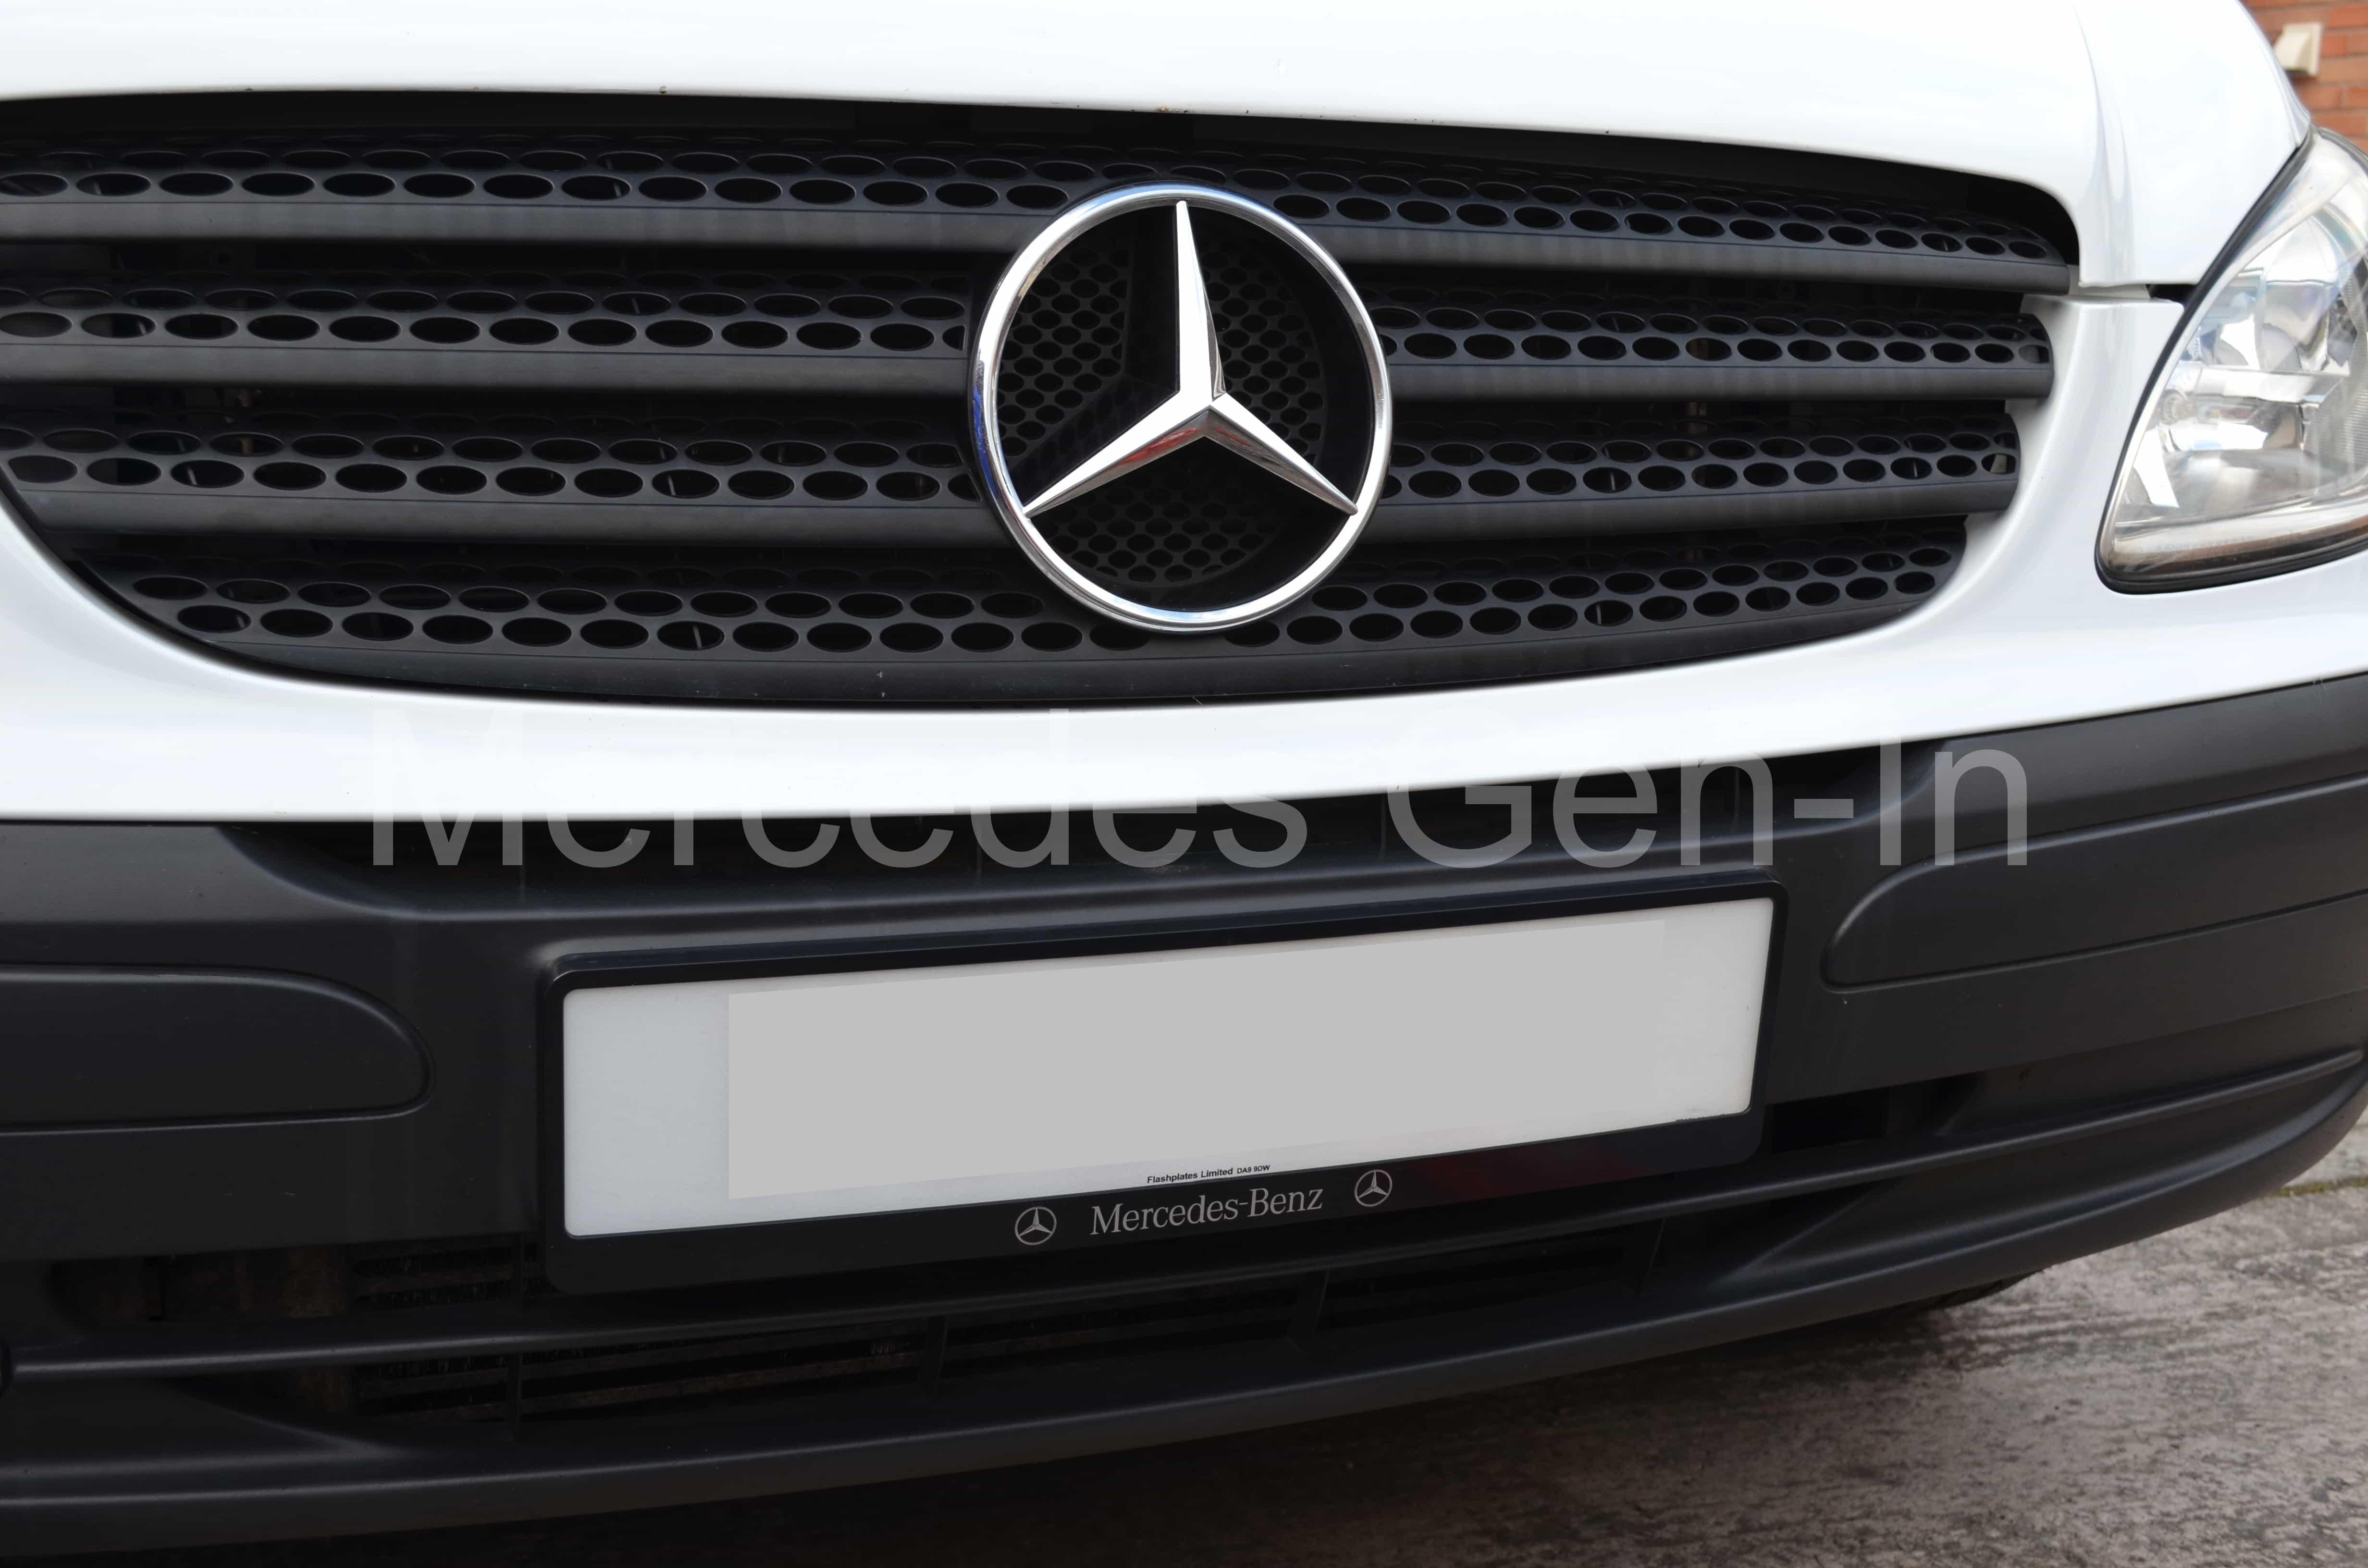 Mercedes vito w639 number plate frame mercedes gen in for Mercedes benz number plate holder